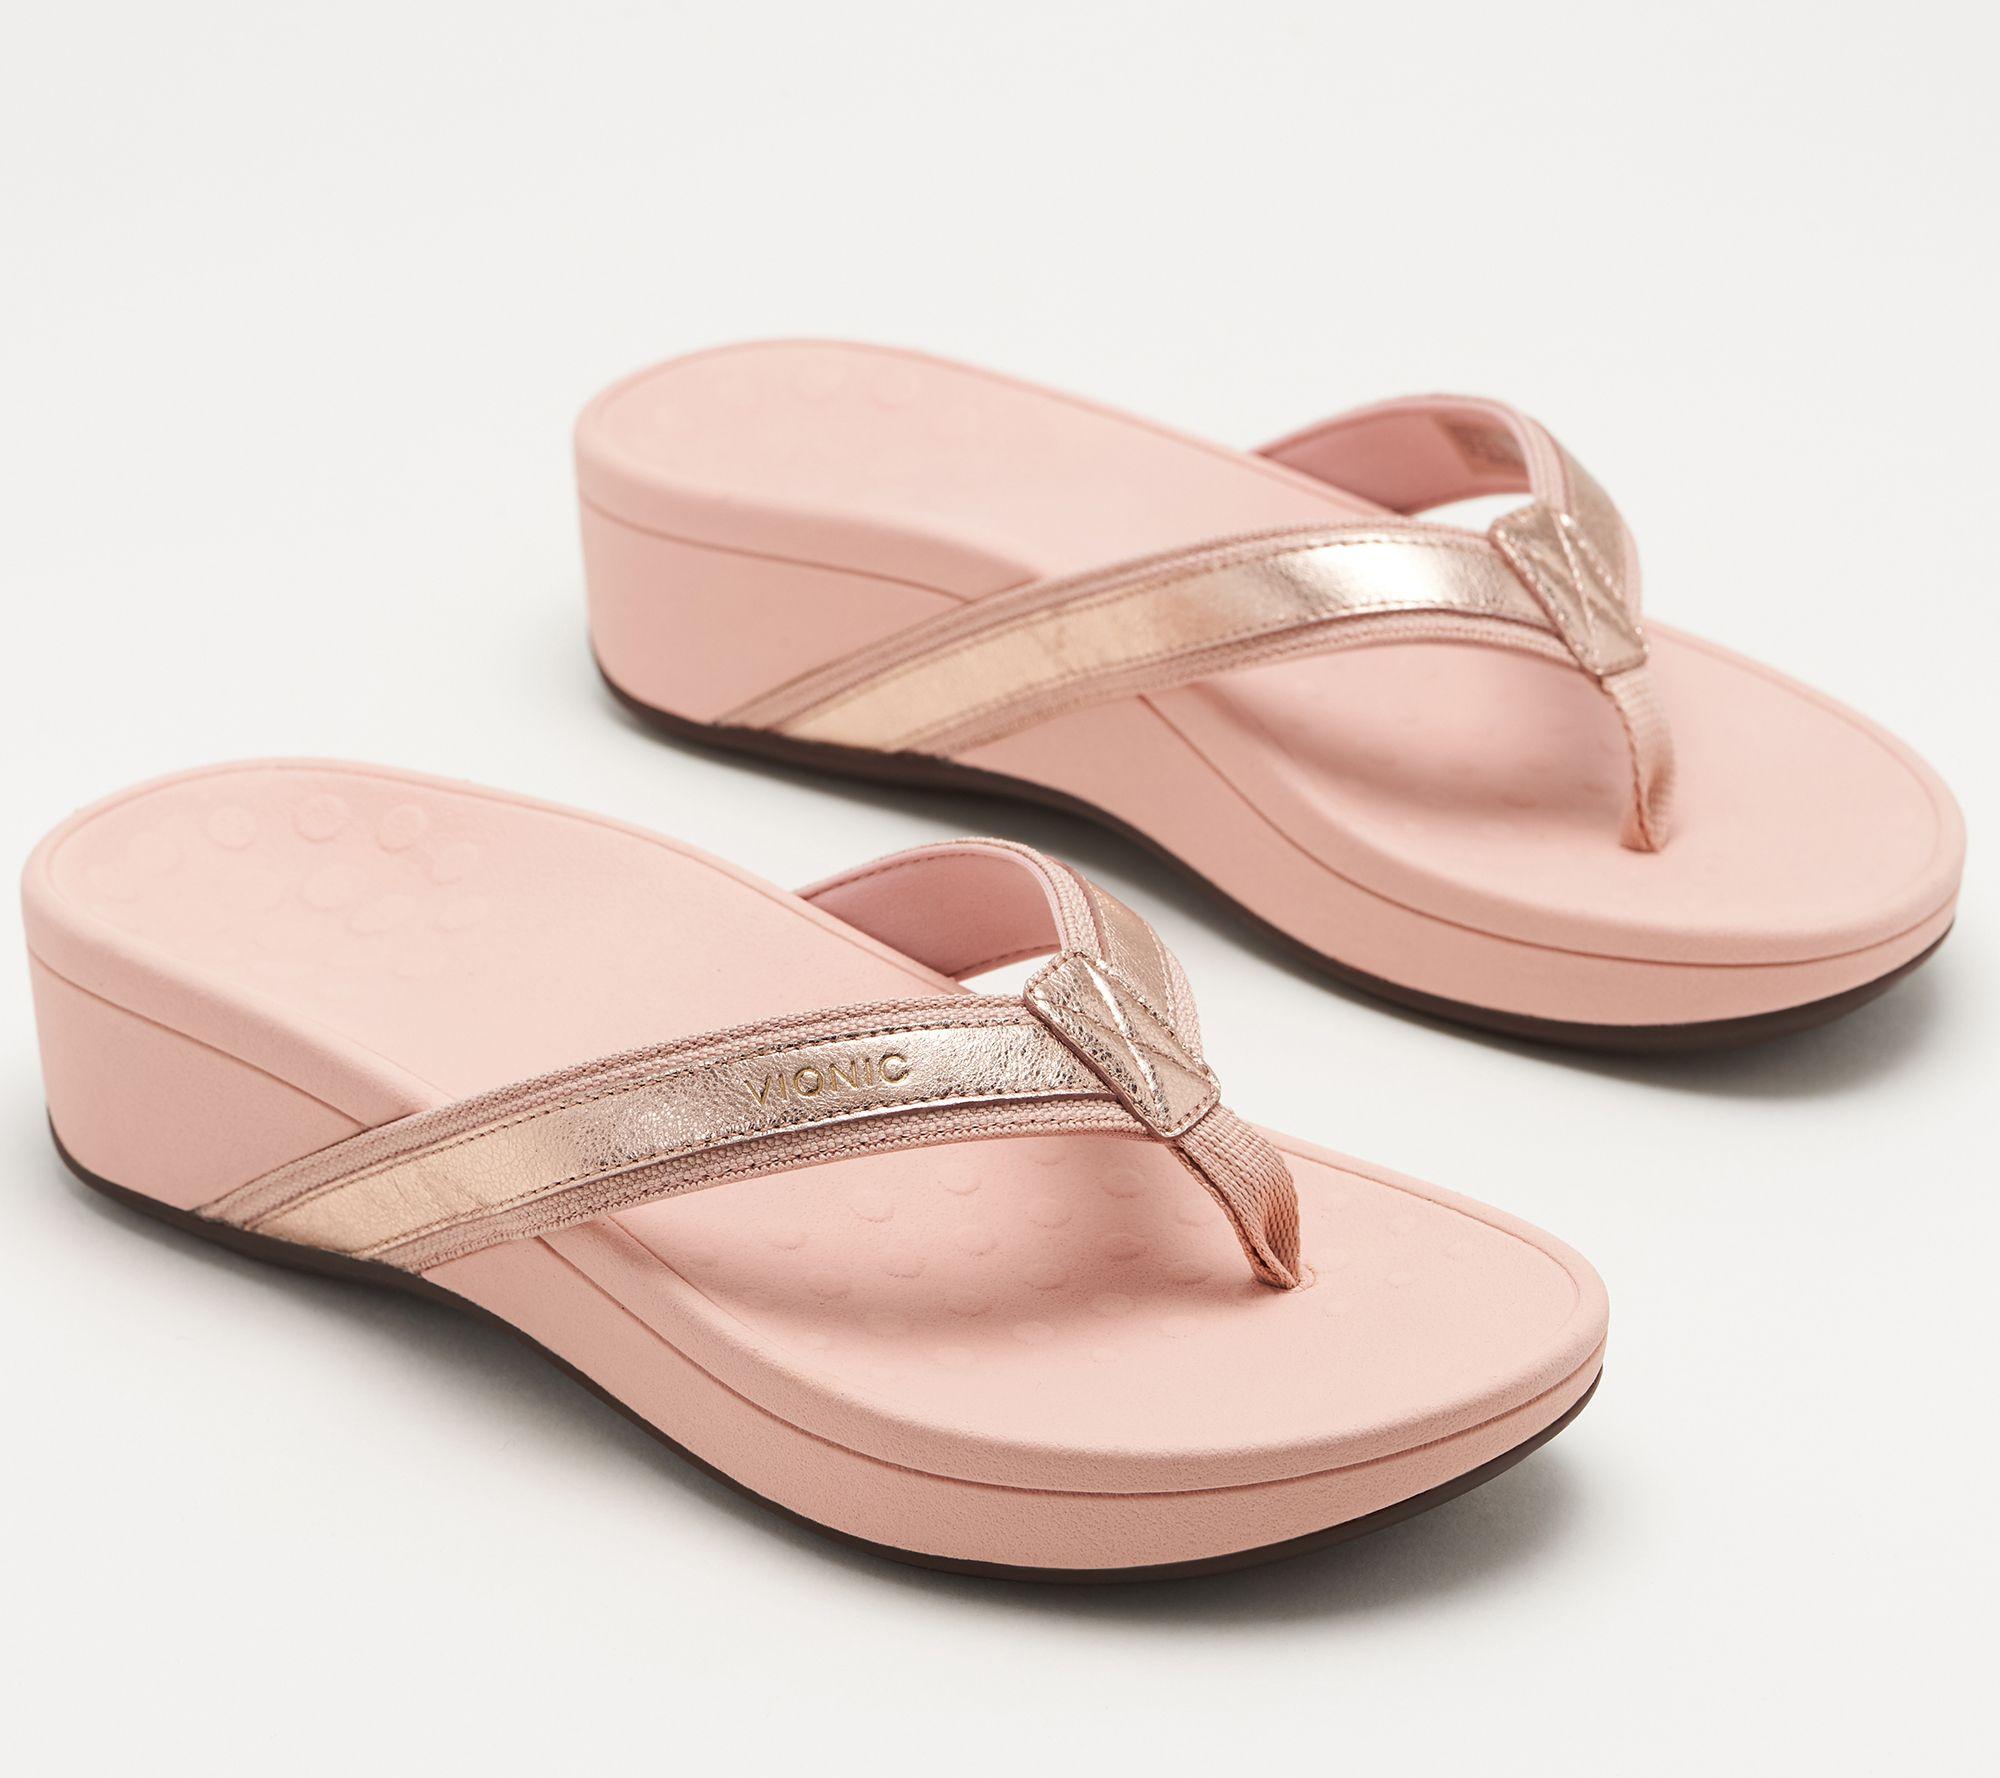 6c11cc3e8ee Vionic Platform Leather Thong Sandals - High Tide Metallic - Page 1 —  QVC.com